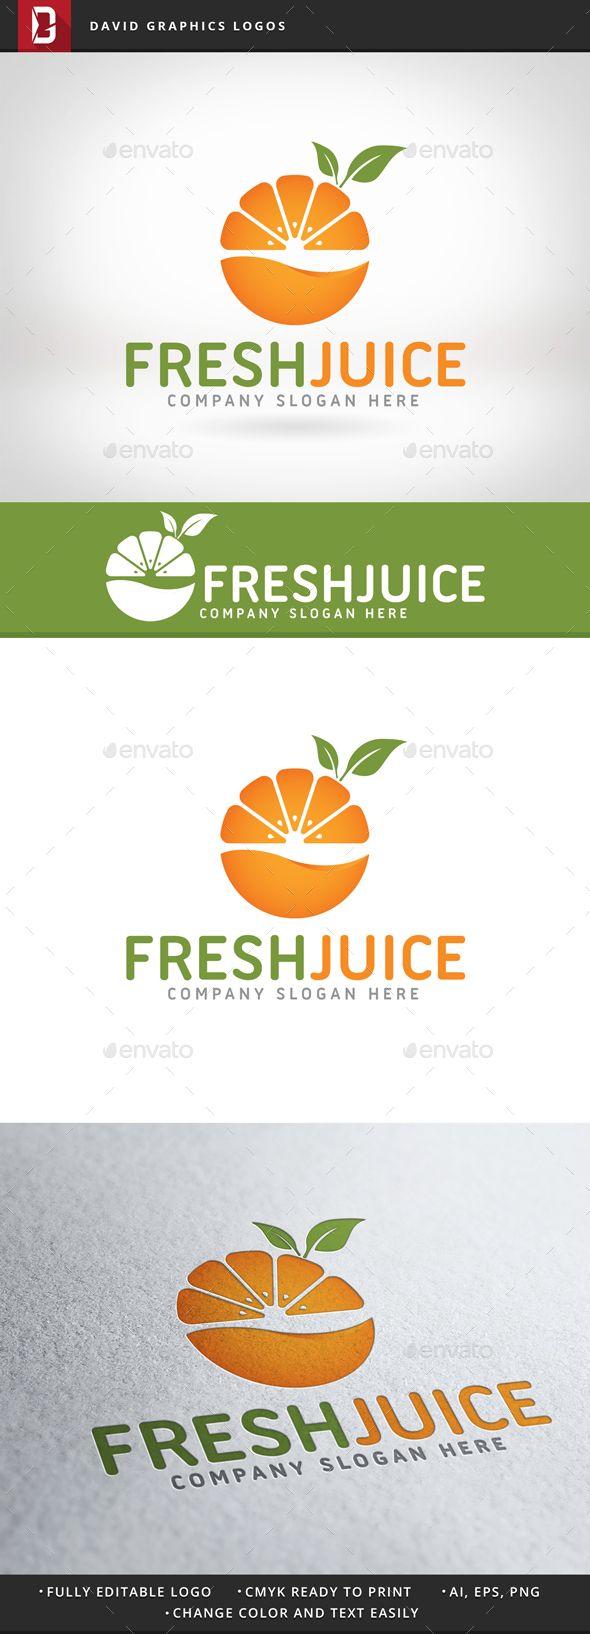 Fresh Juice Logo - Nature Logo Templates                                                                                                                                                                                 More